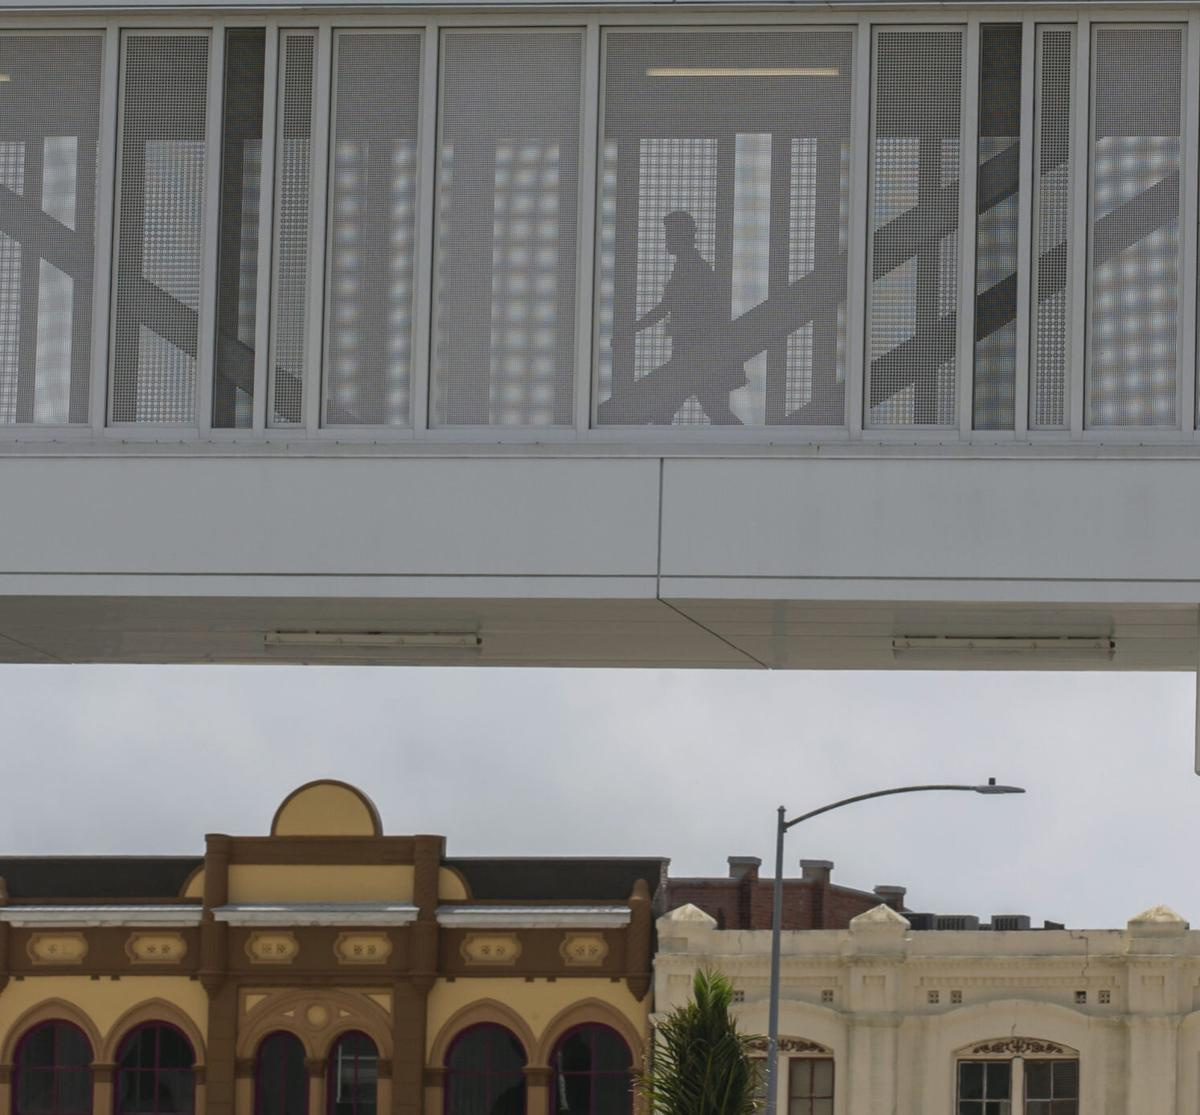 ANICO Pedestrian Bridge